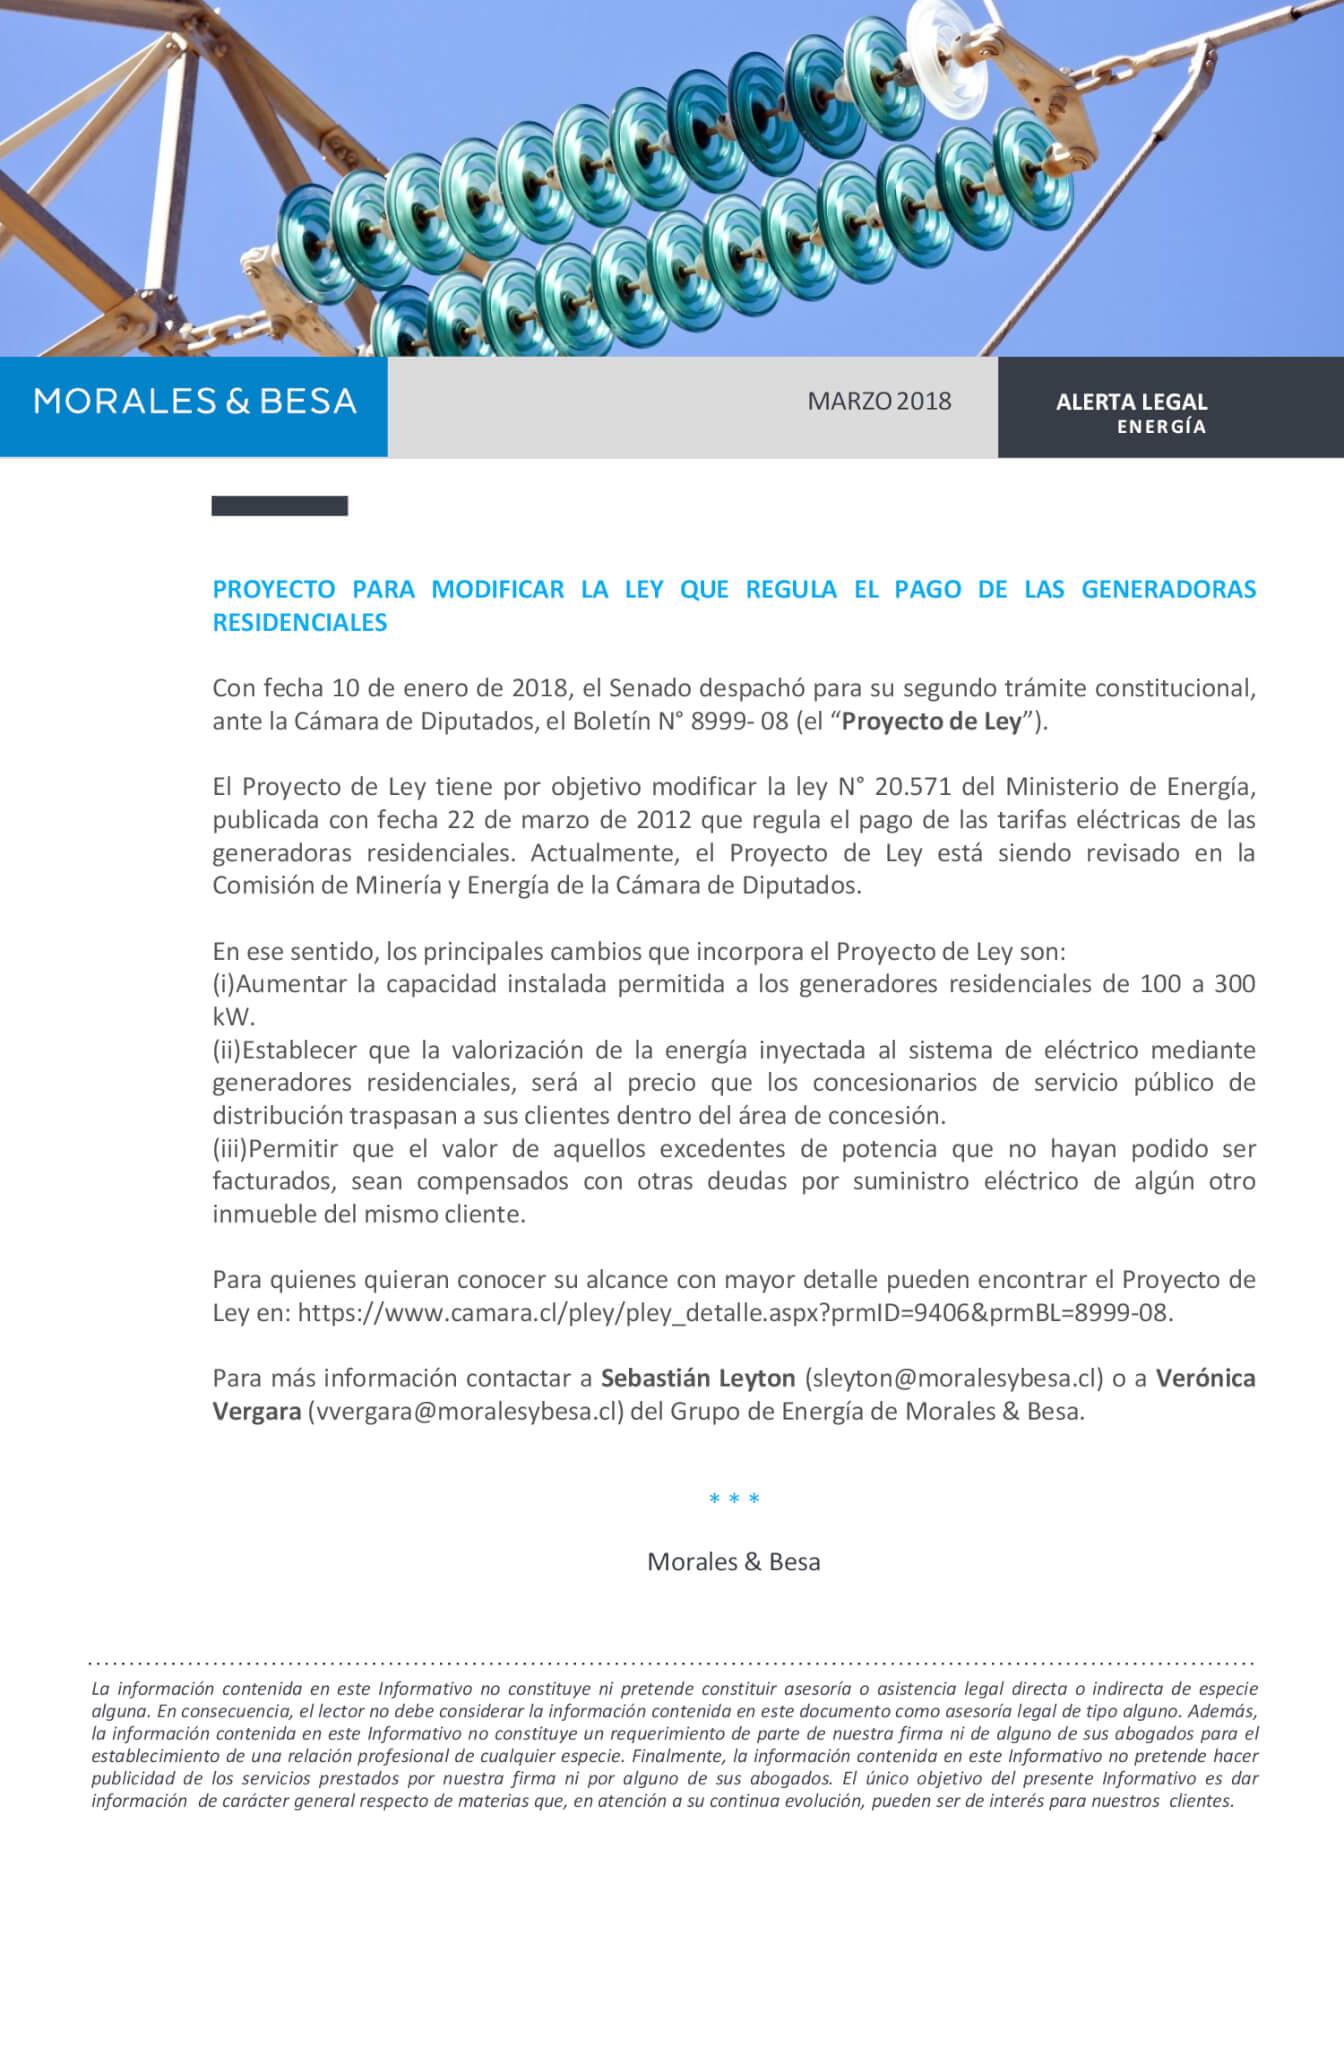 Morales-Besa_-Alerta-Legal_Energía-marzo-2018_ok